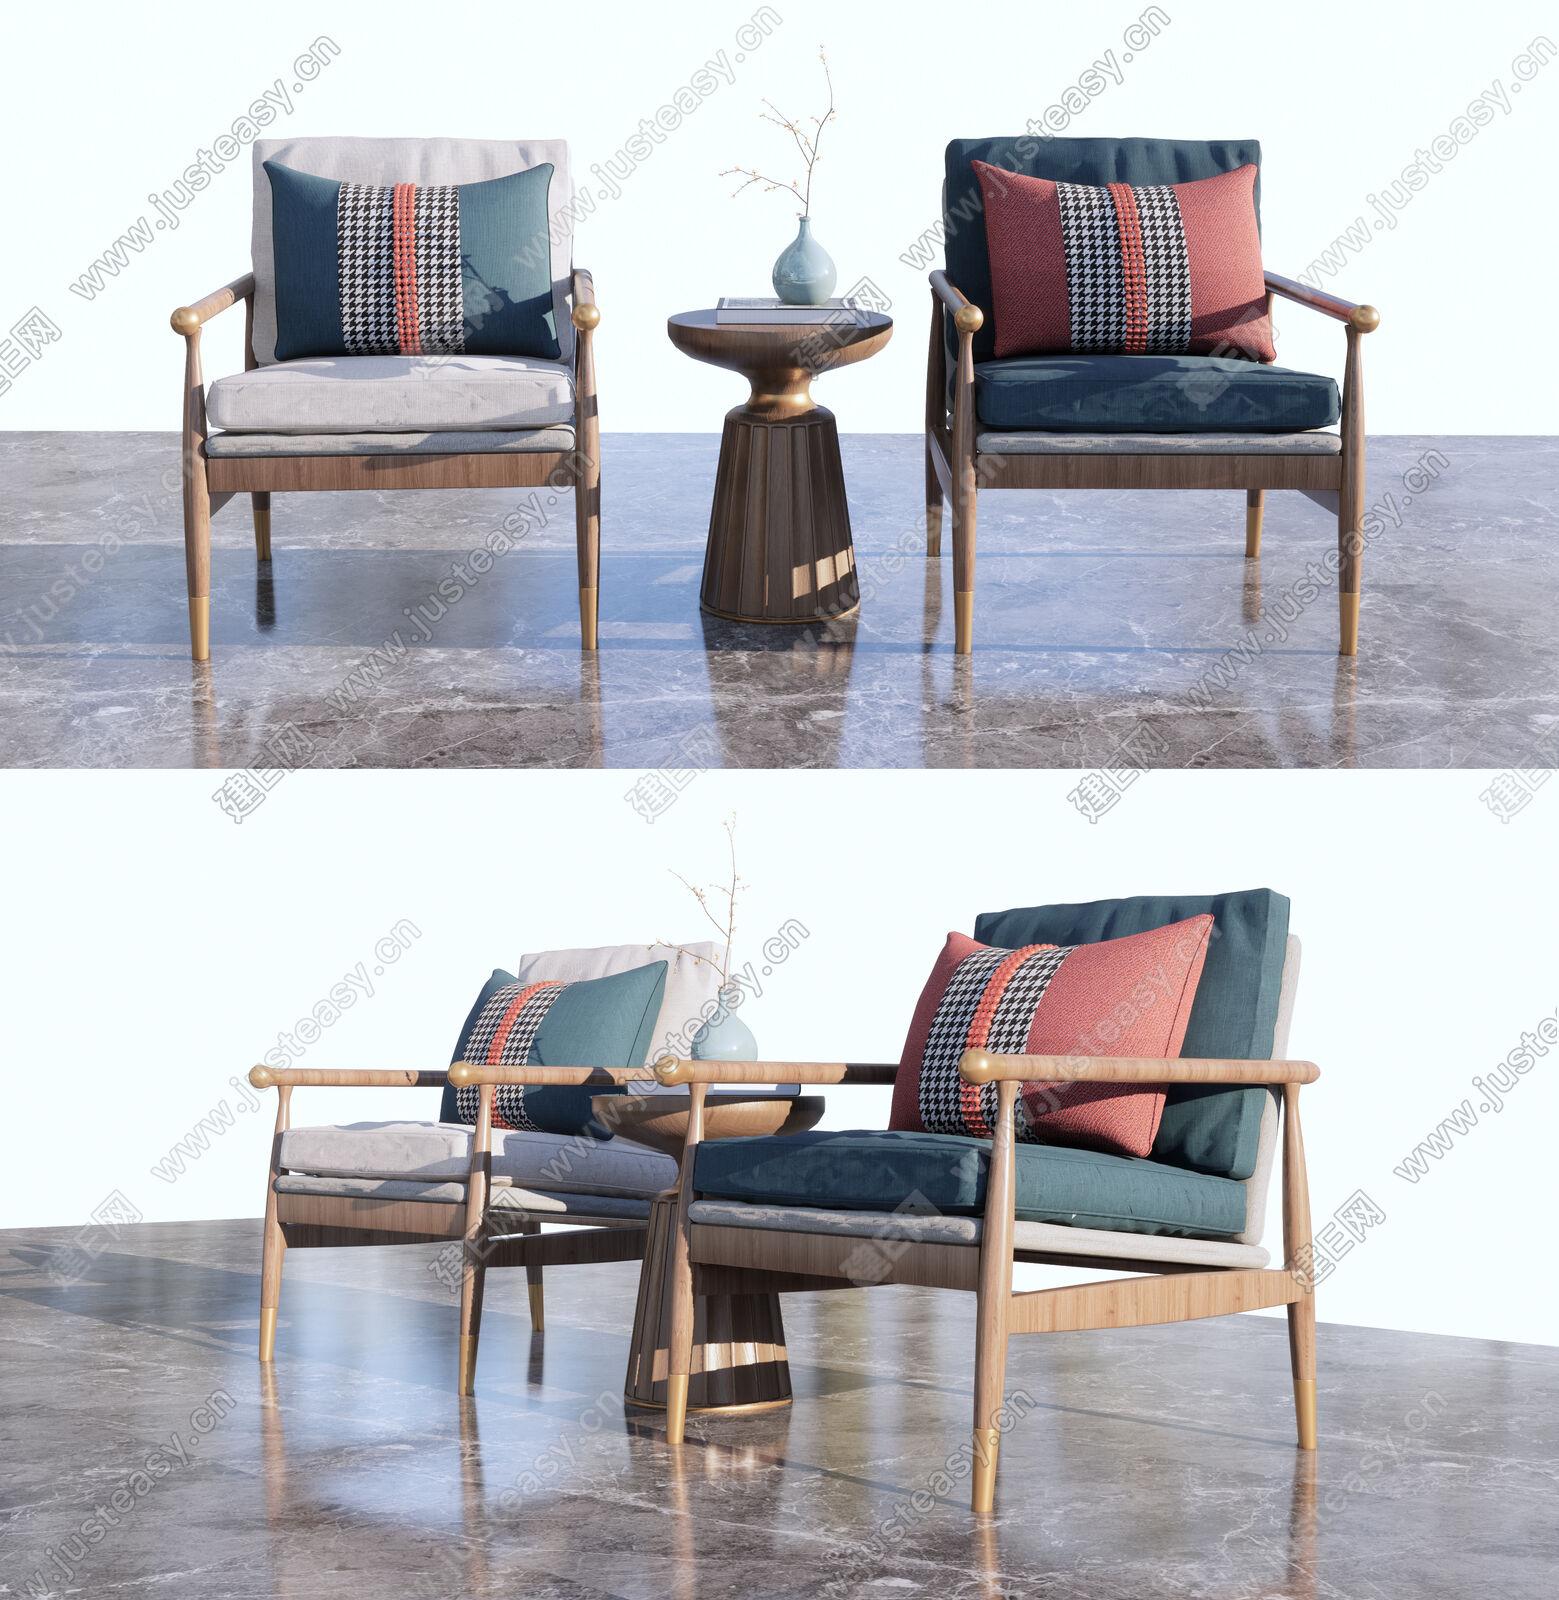 新中式单椅sketchup模型